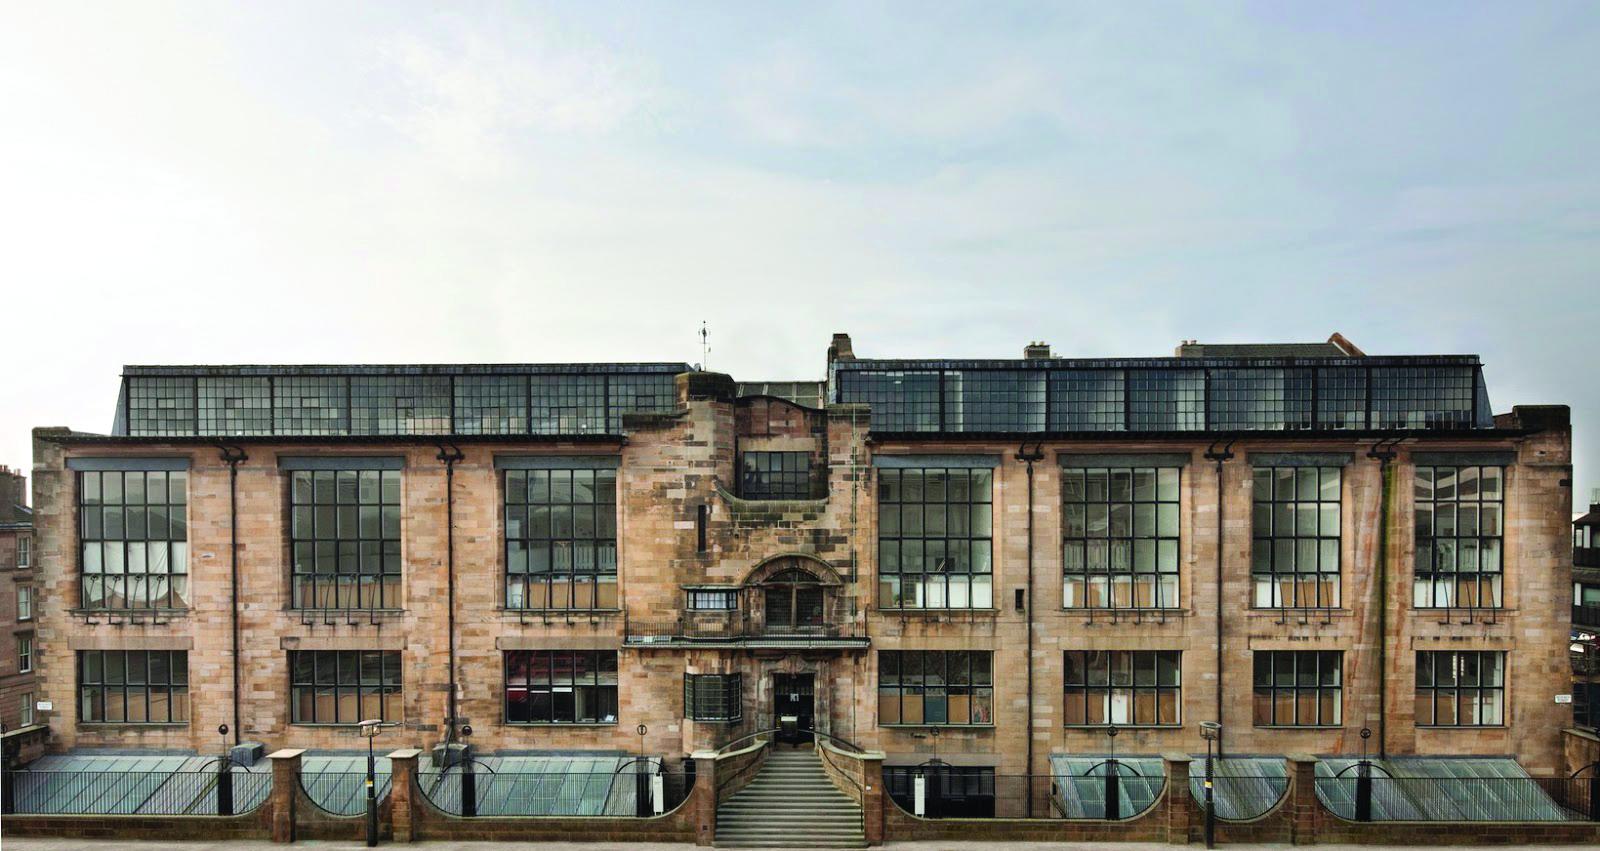 Facade of Glasgow School of Art